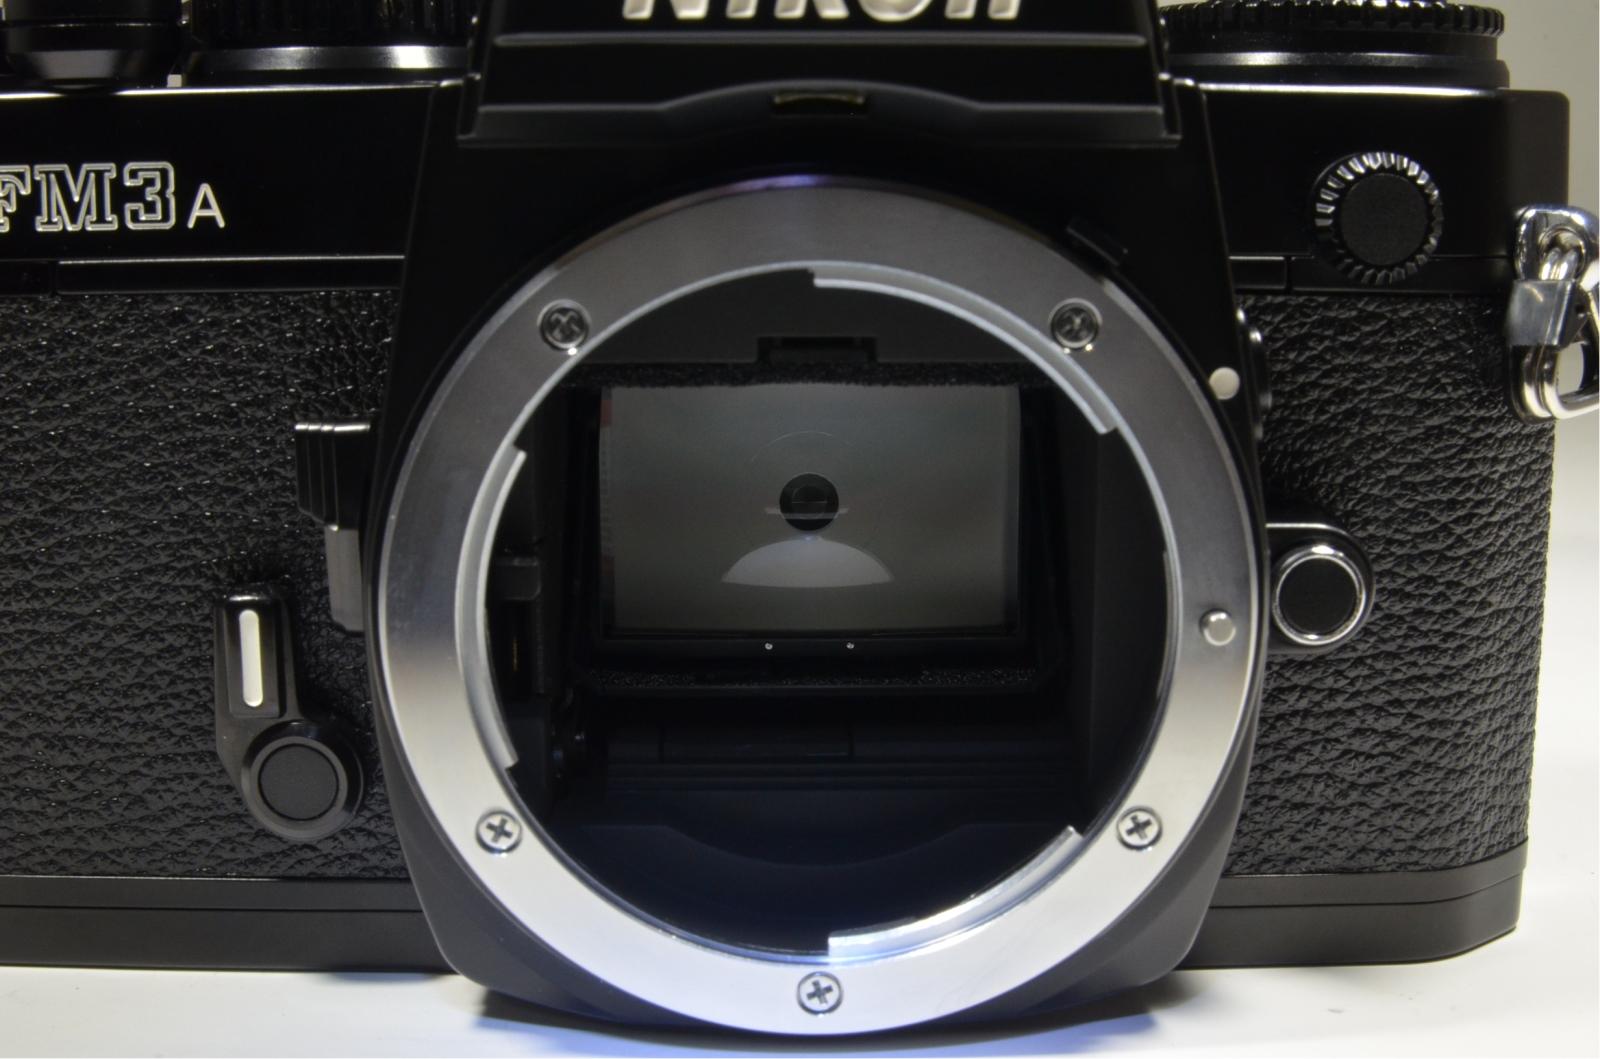 nikon fm3a 35mm film camera black with cf-27